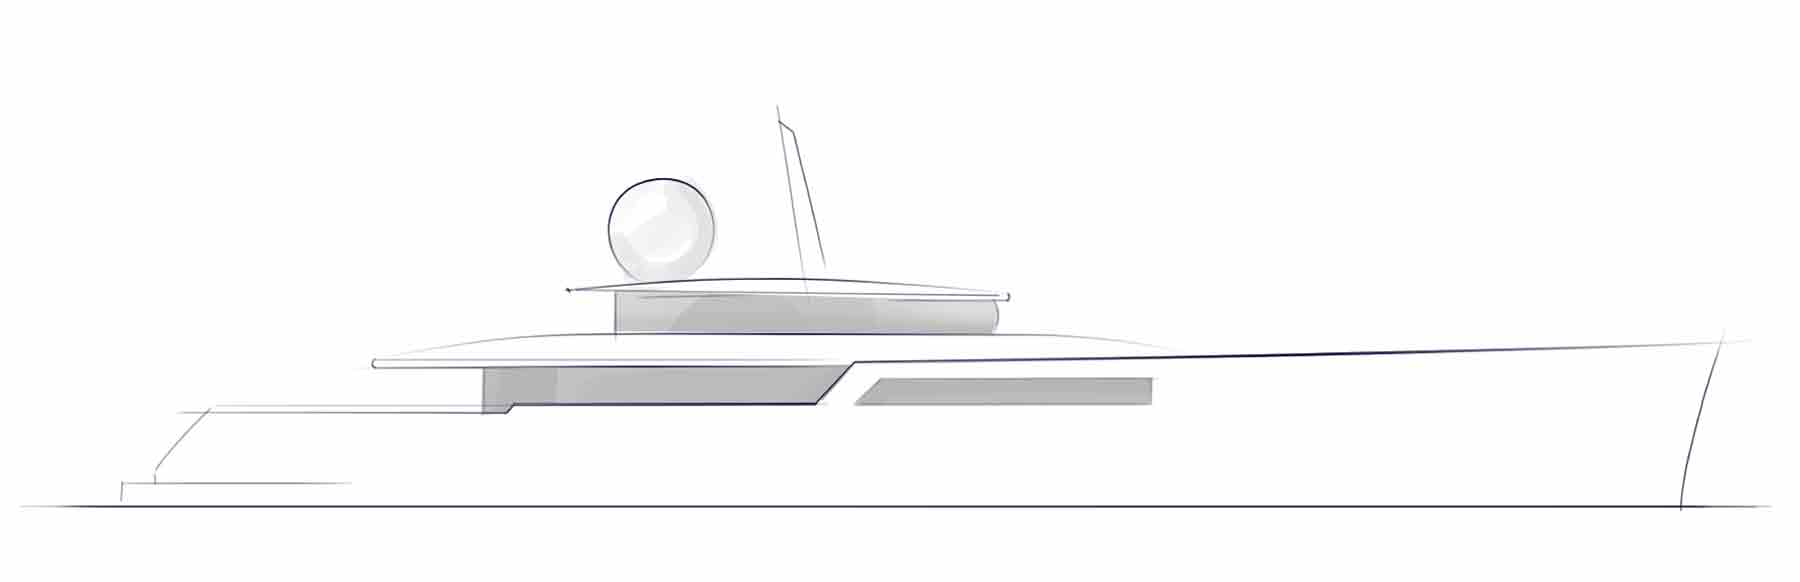 explorer yacht design sketch